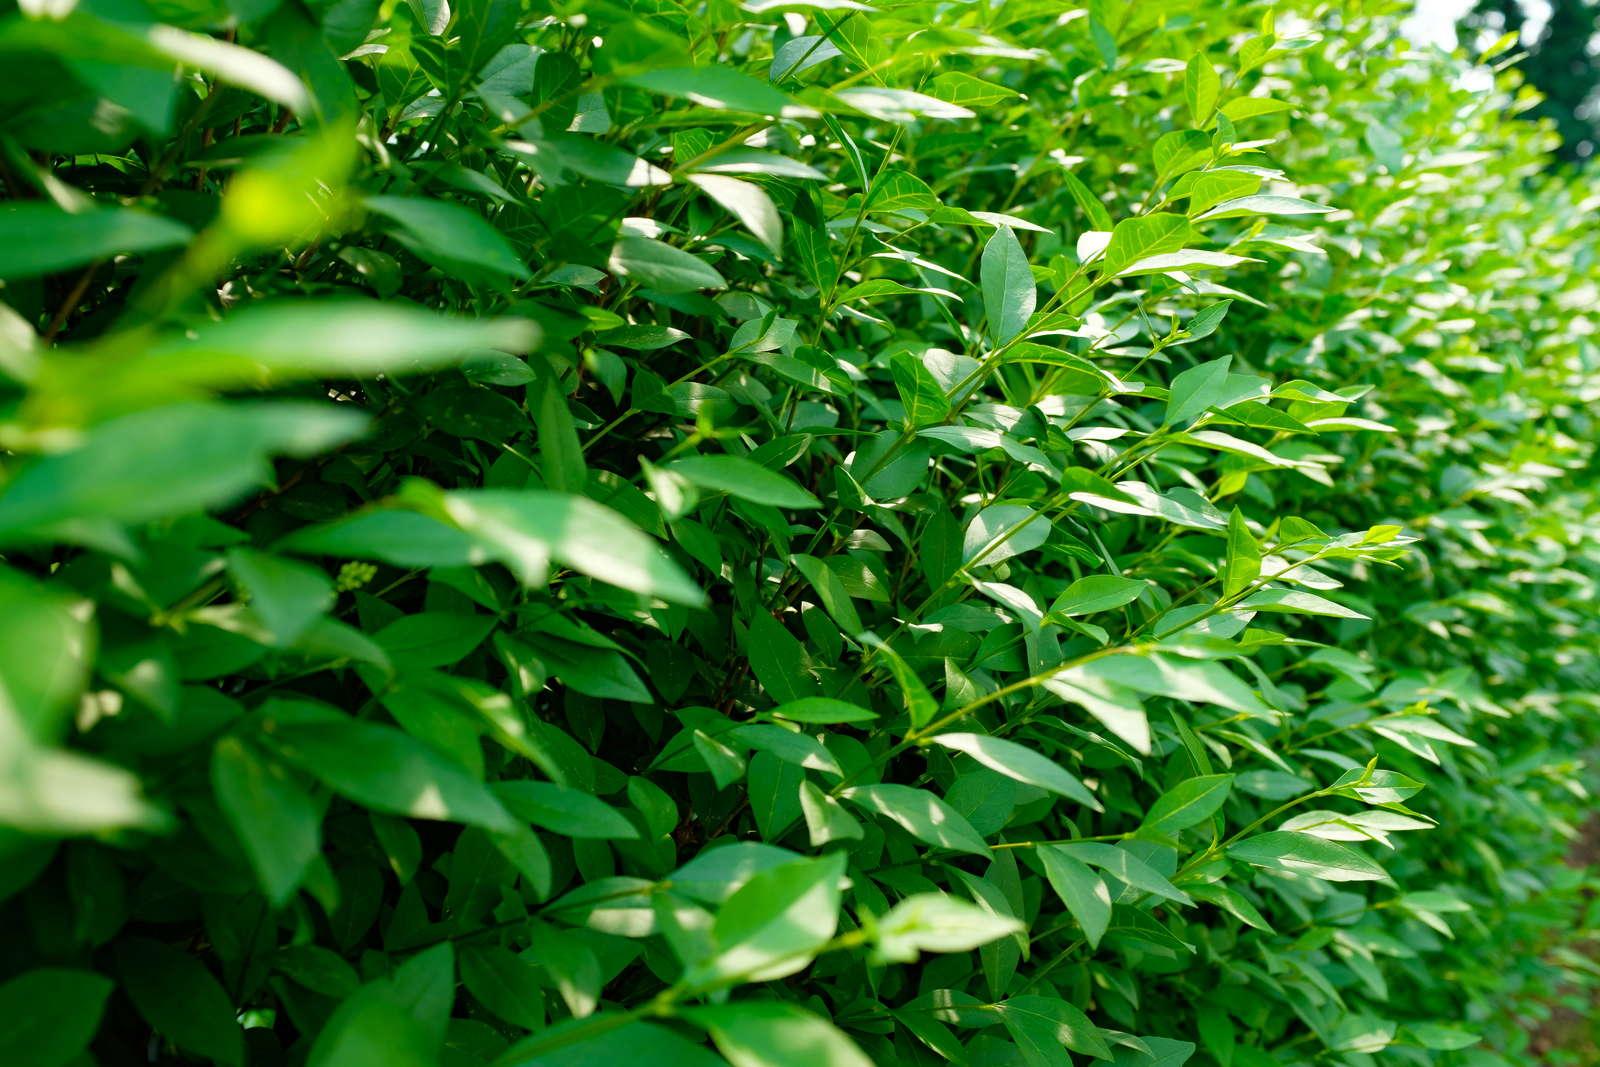 Liguster Arten Immergrune Robuste Liguster Hecken Plantura